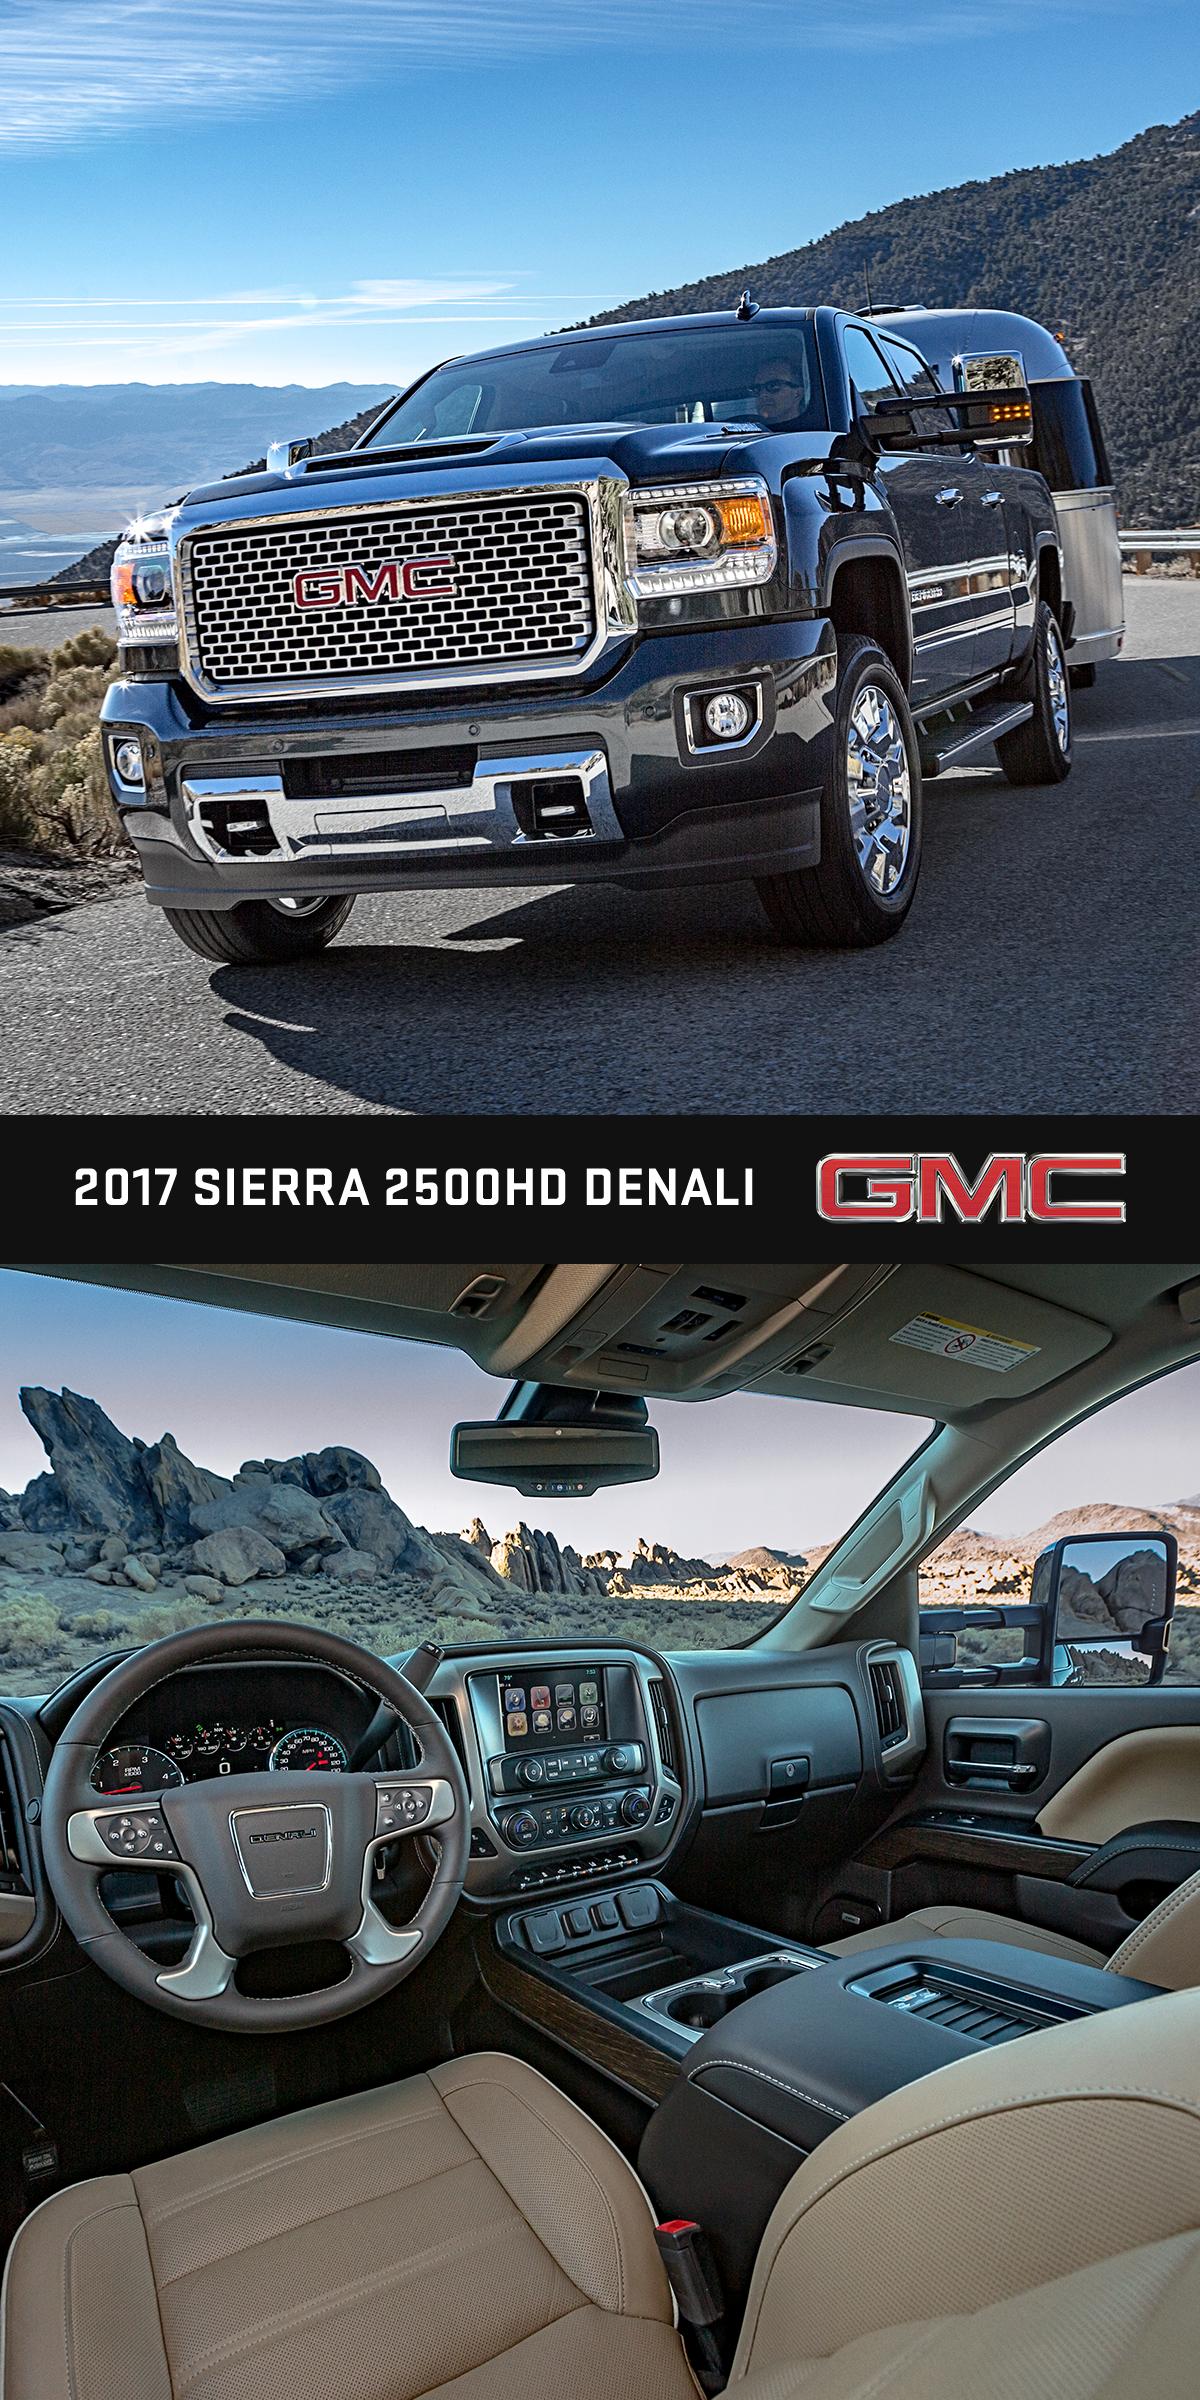 The Gmc Sierra 2500 Denail Hd Is Our Most Powerful Duramax Diesel Ever Sierra 2500 Denali Hd Offers Functional Hood Scoop On Duramax Gmc Truck Gmc Trucks Gmc